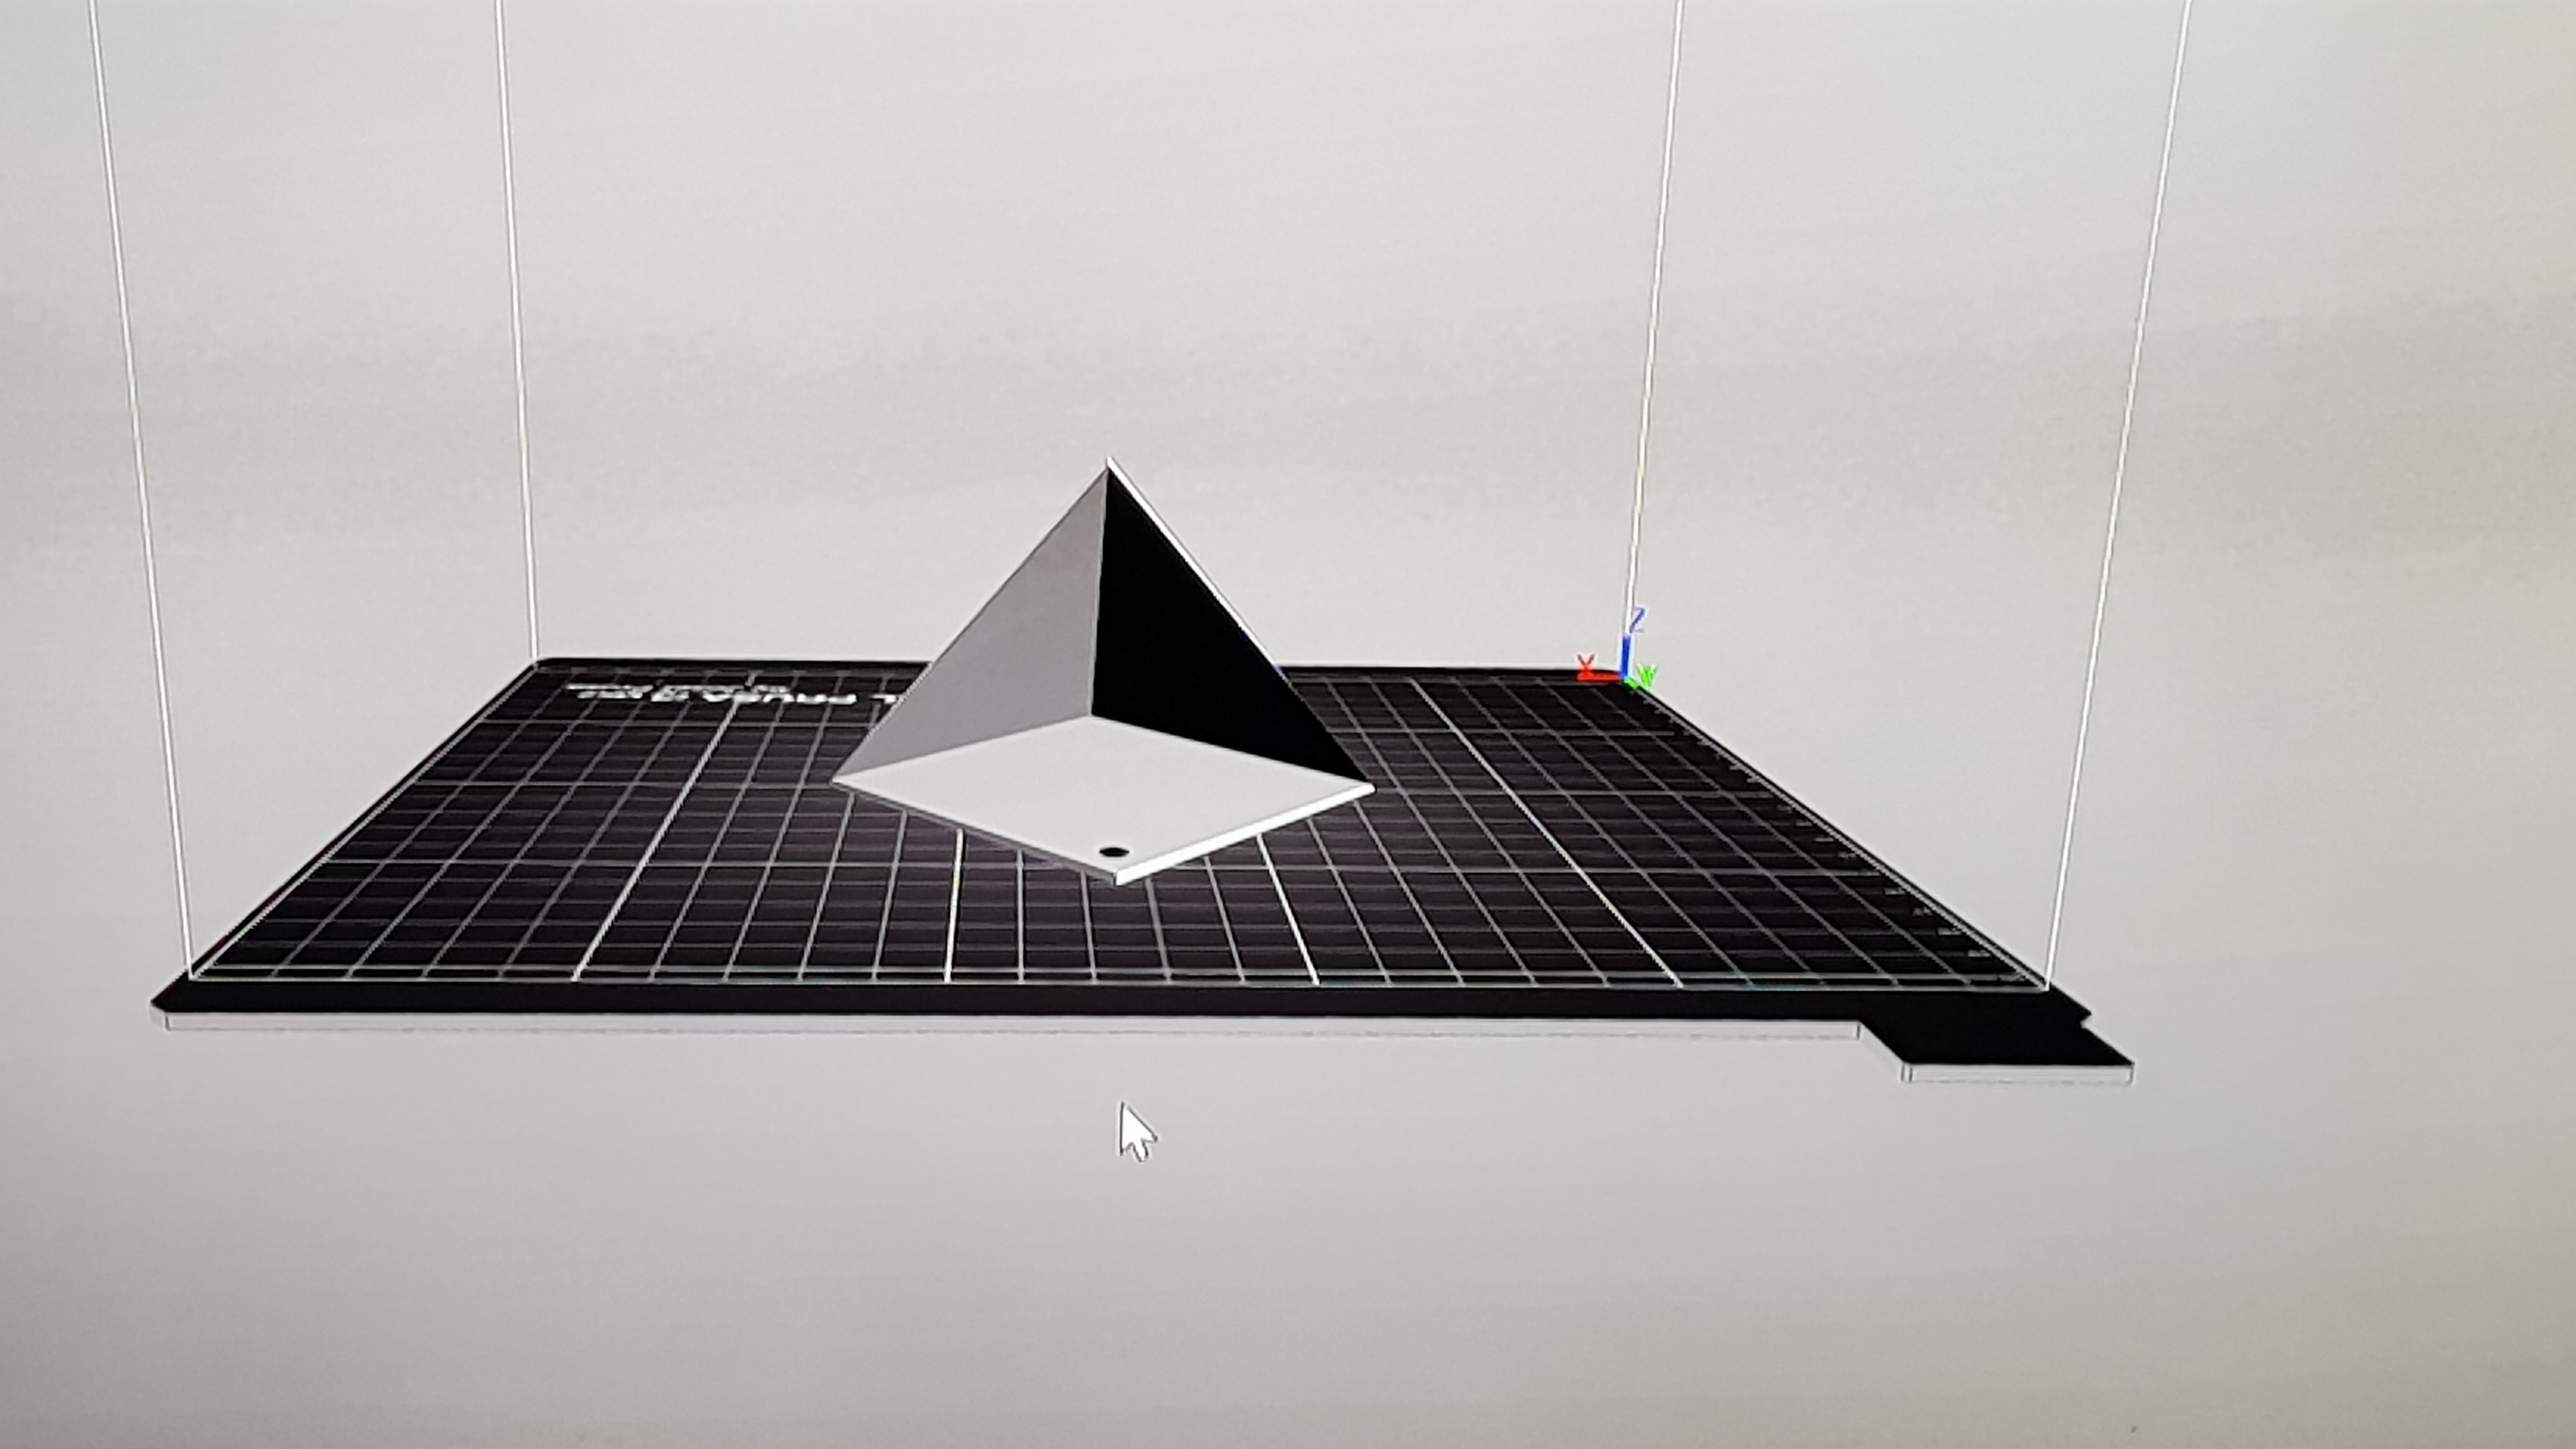 20180208_193654.jpg Download free STL file wall hanging triangle planter • 3D printing template, solunkejagruti